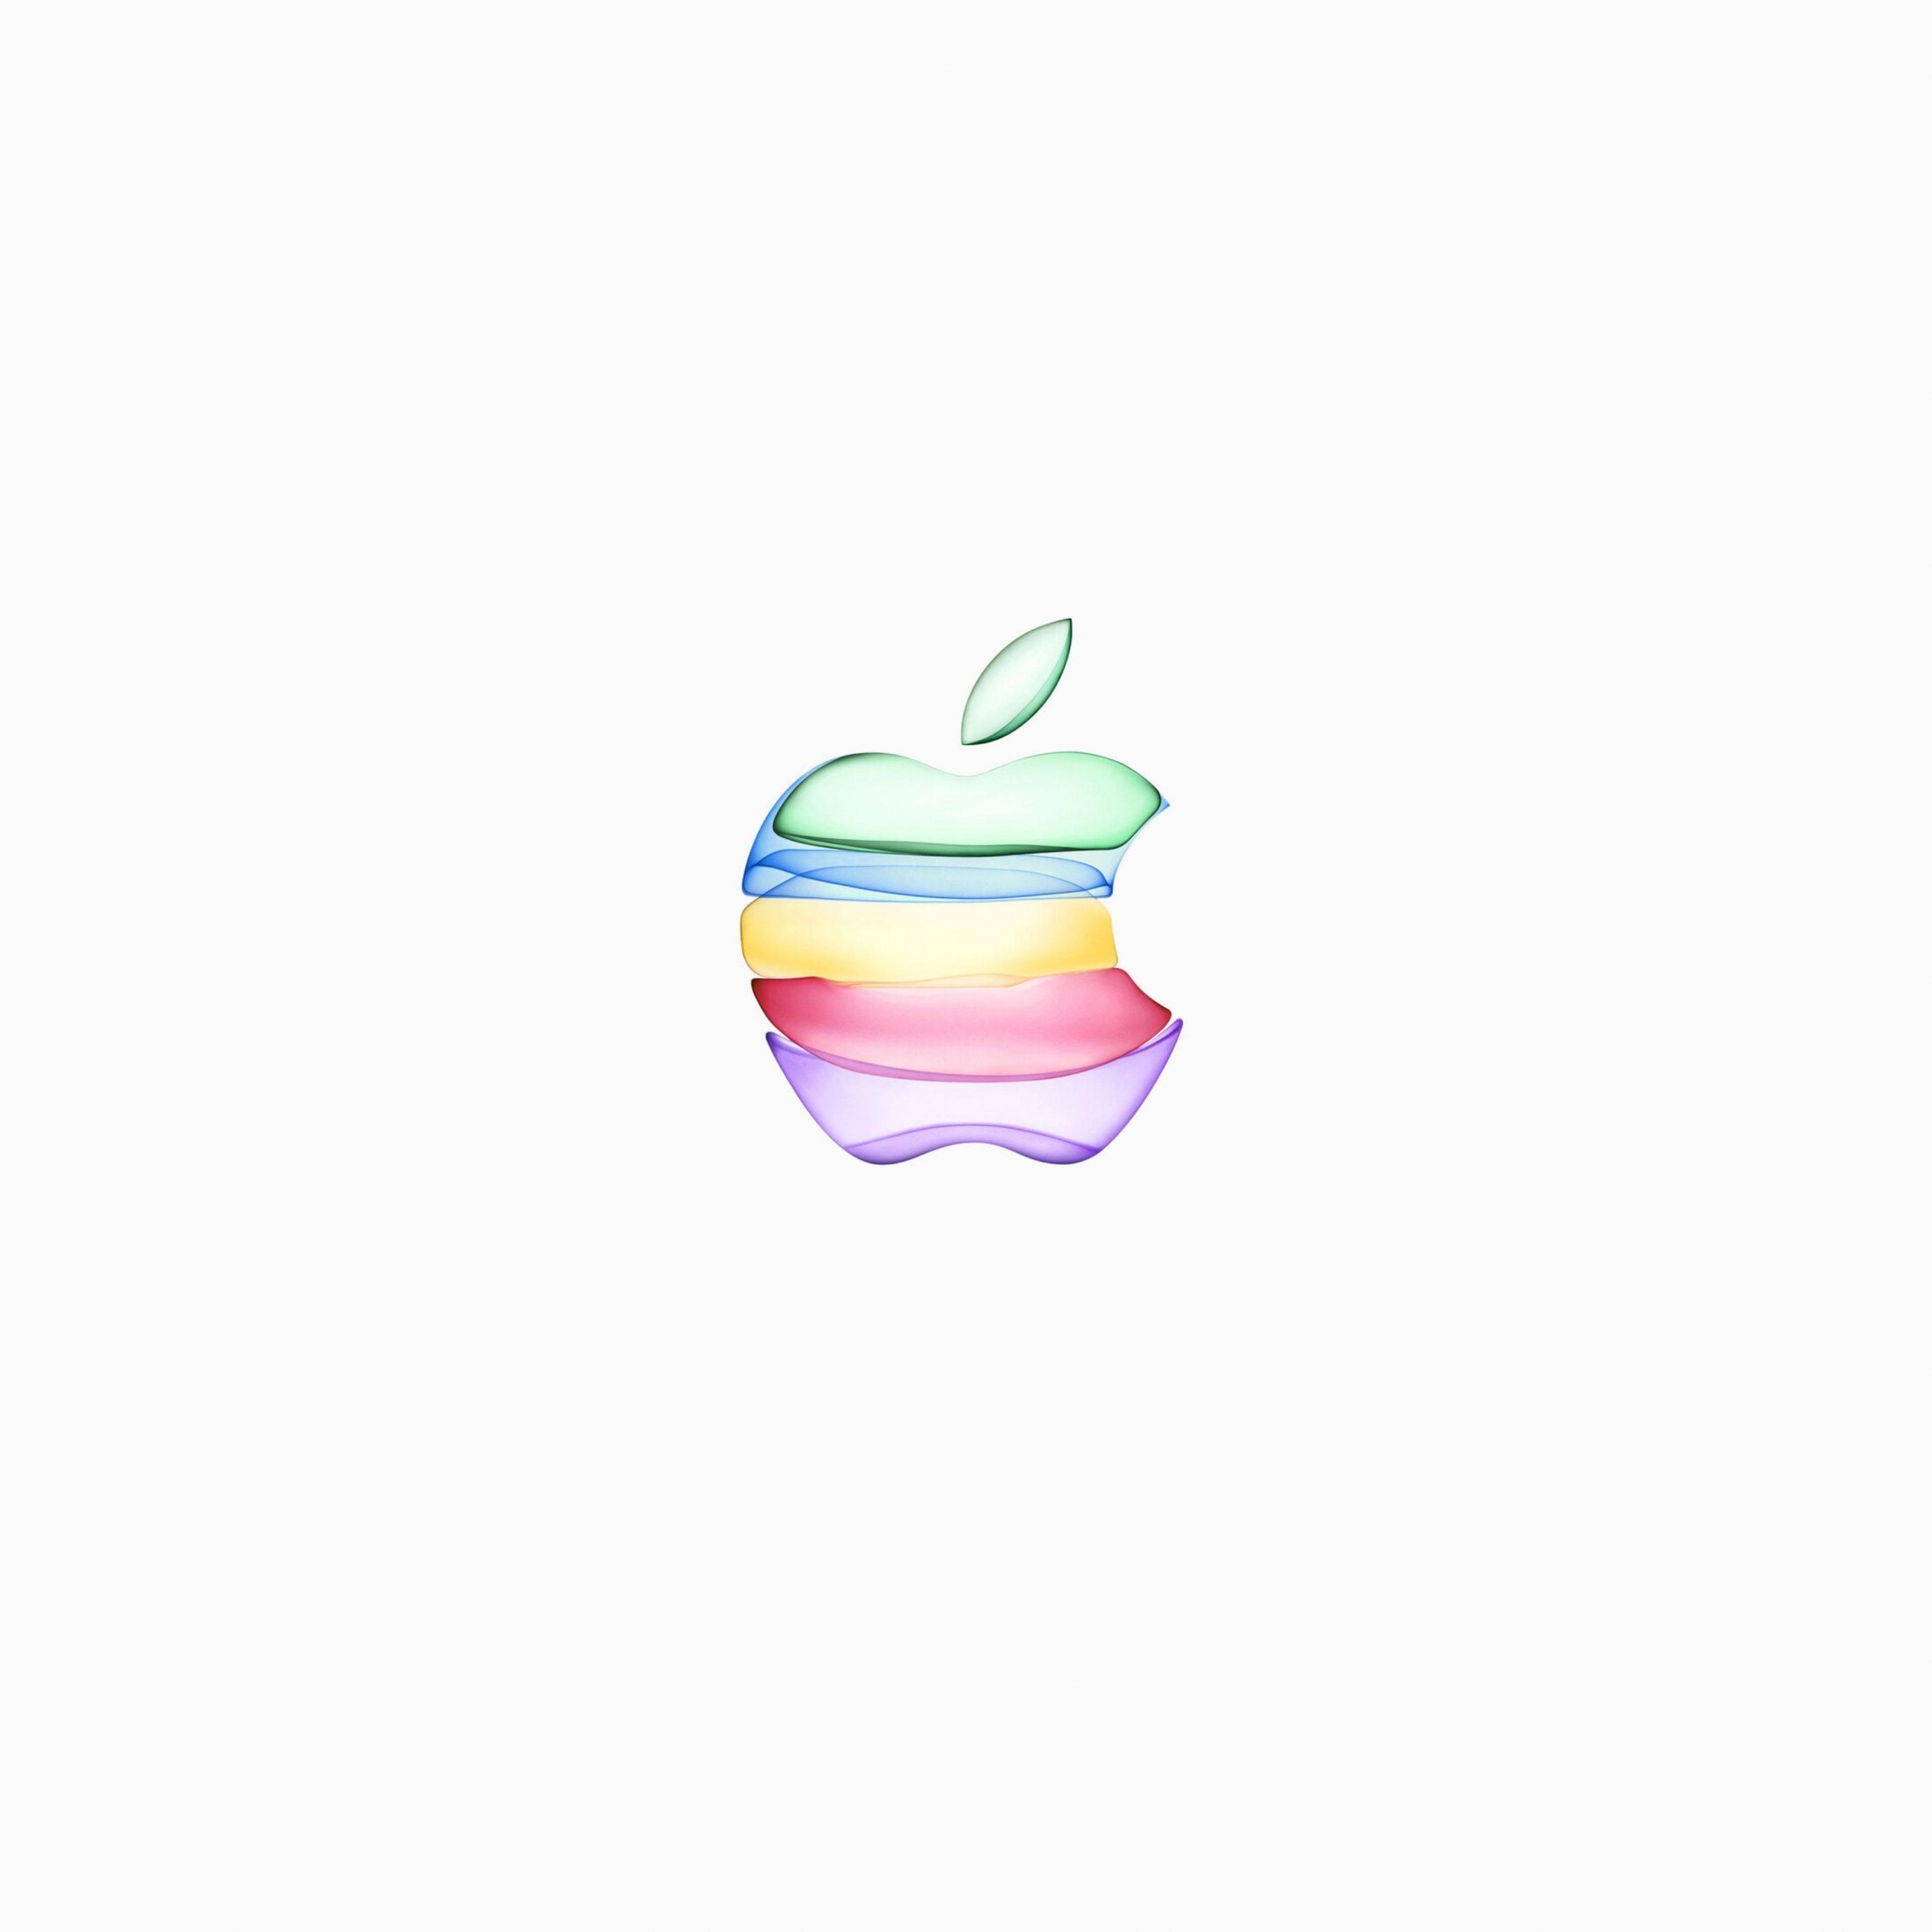 2780x2780 Parallax wallpaper 4k iPhone 11 Apple Logo White Background iPad Wallpaper 2780x2780 pixels resolution